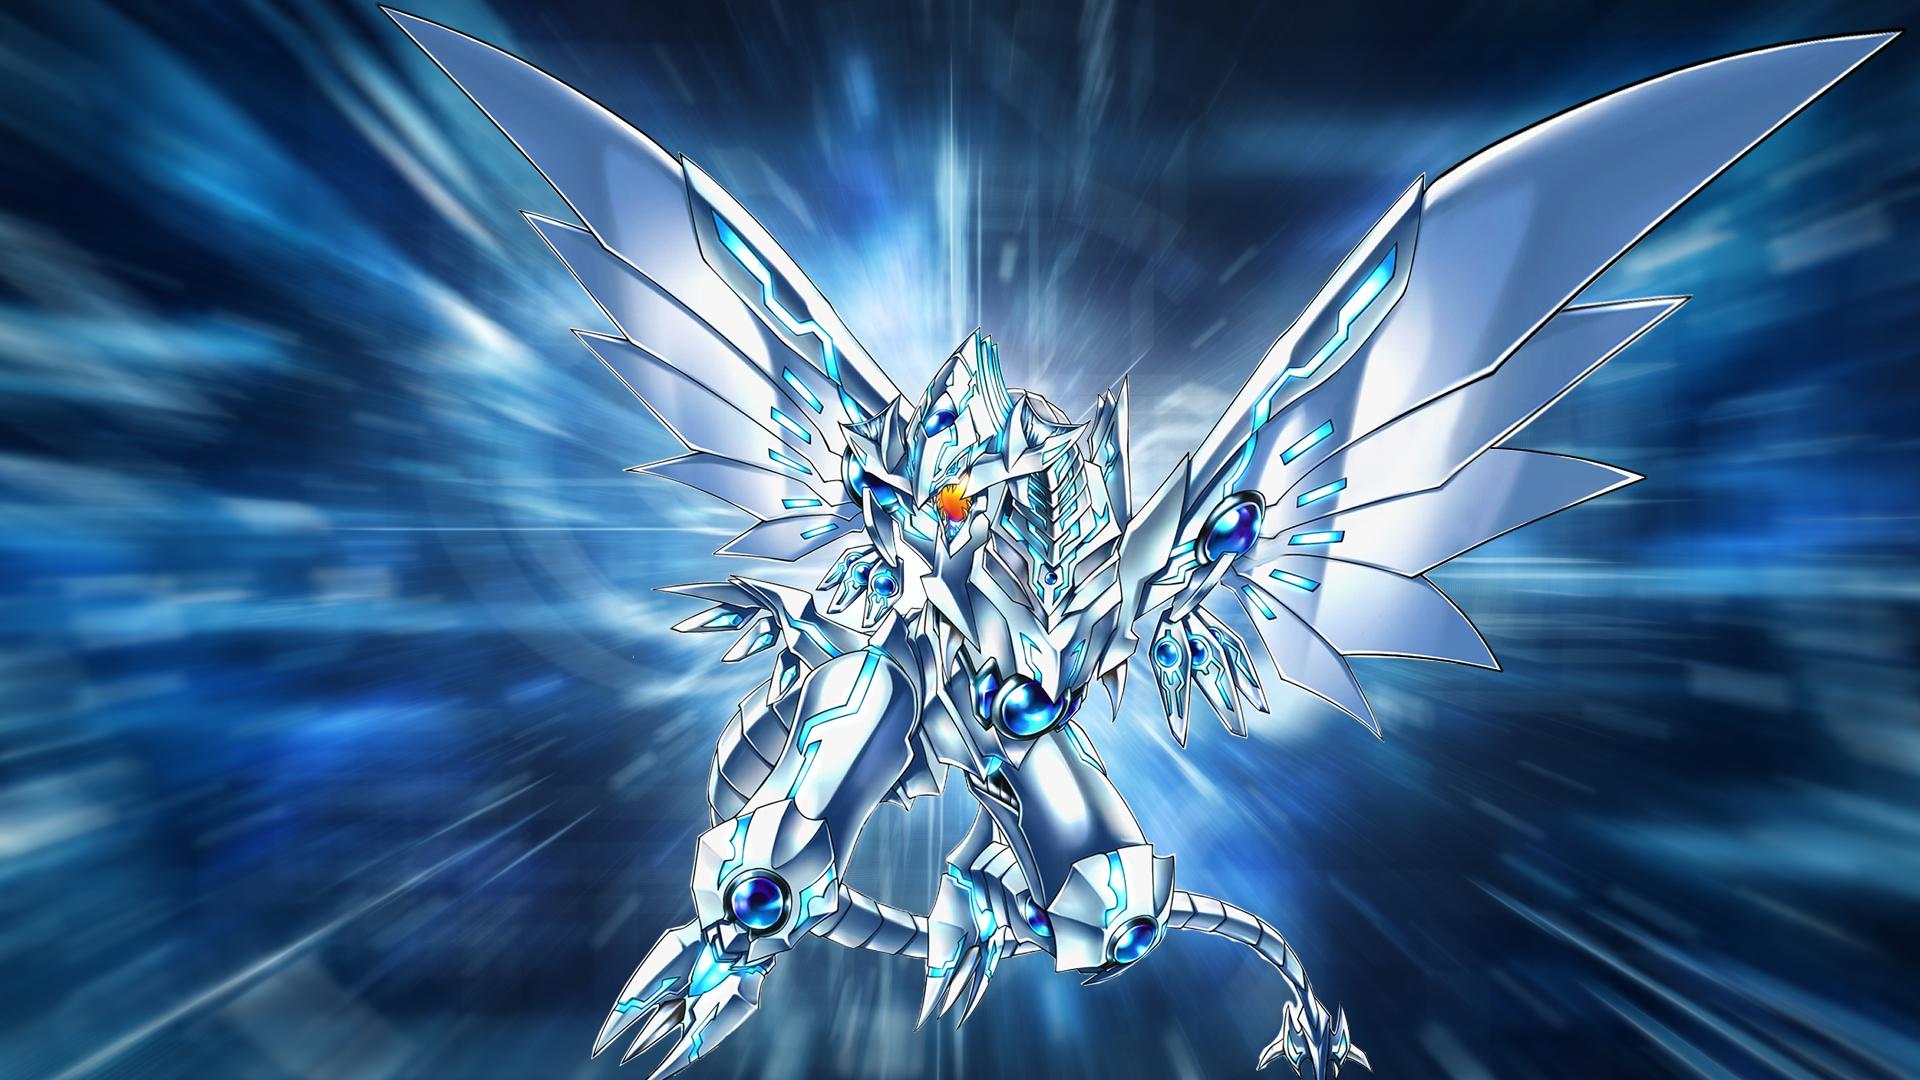 Neo Blue Eyes Shining Dragon Wallpaper By Dino Master On Deviantart